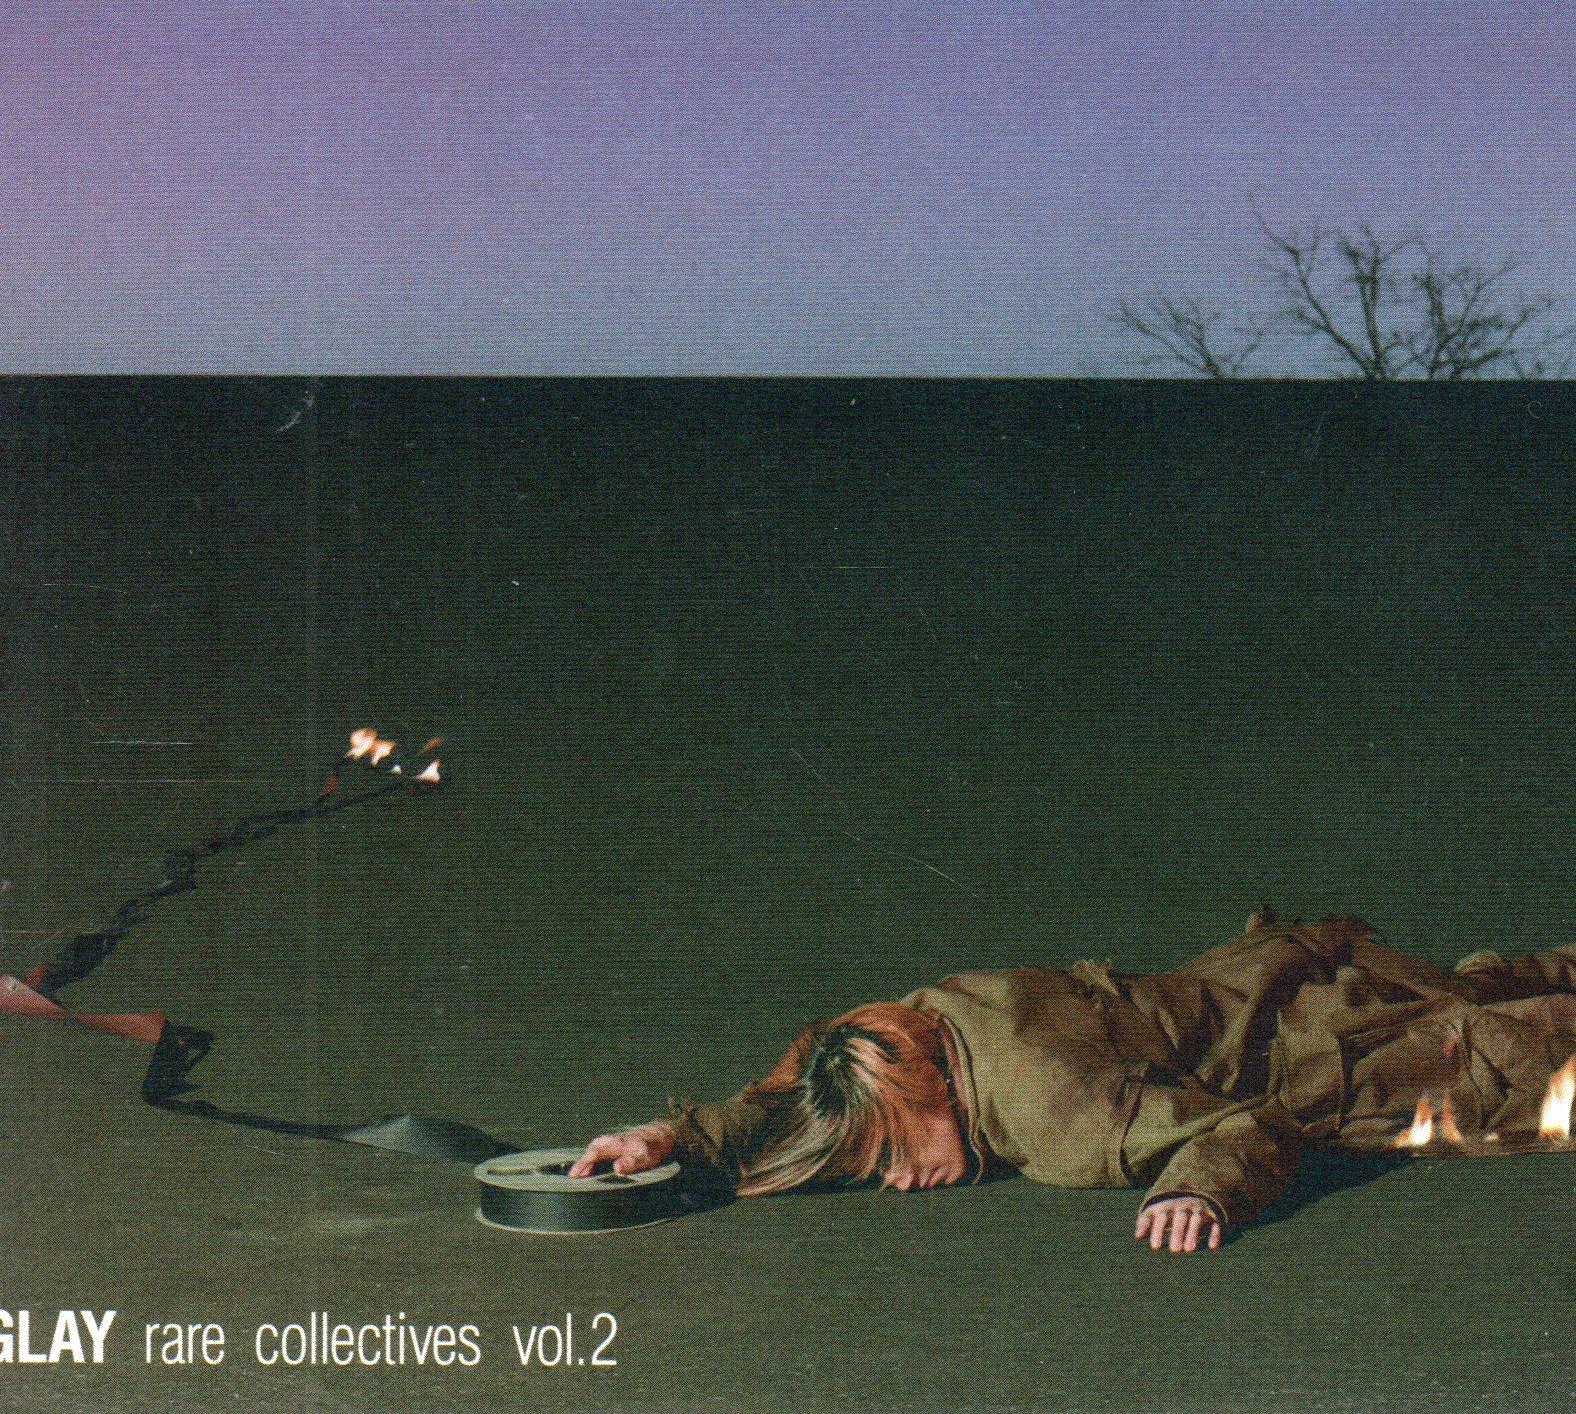 GLAY 獨二精選 rare collectives Vol.2 2CD 附外紙盒 再生工場02